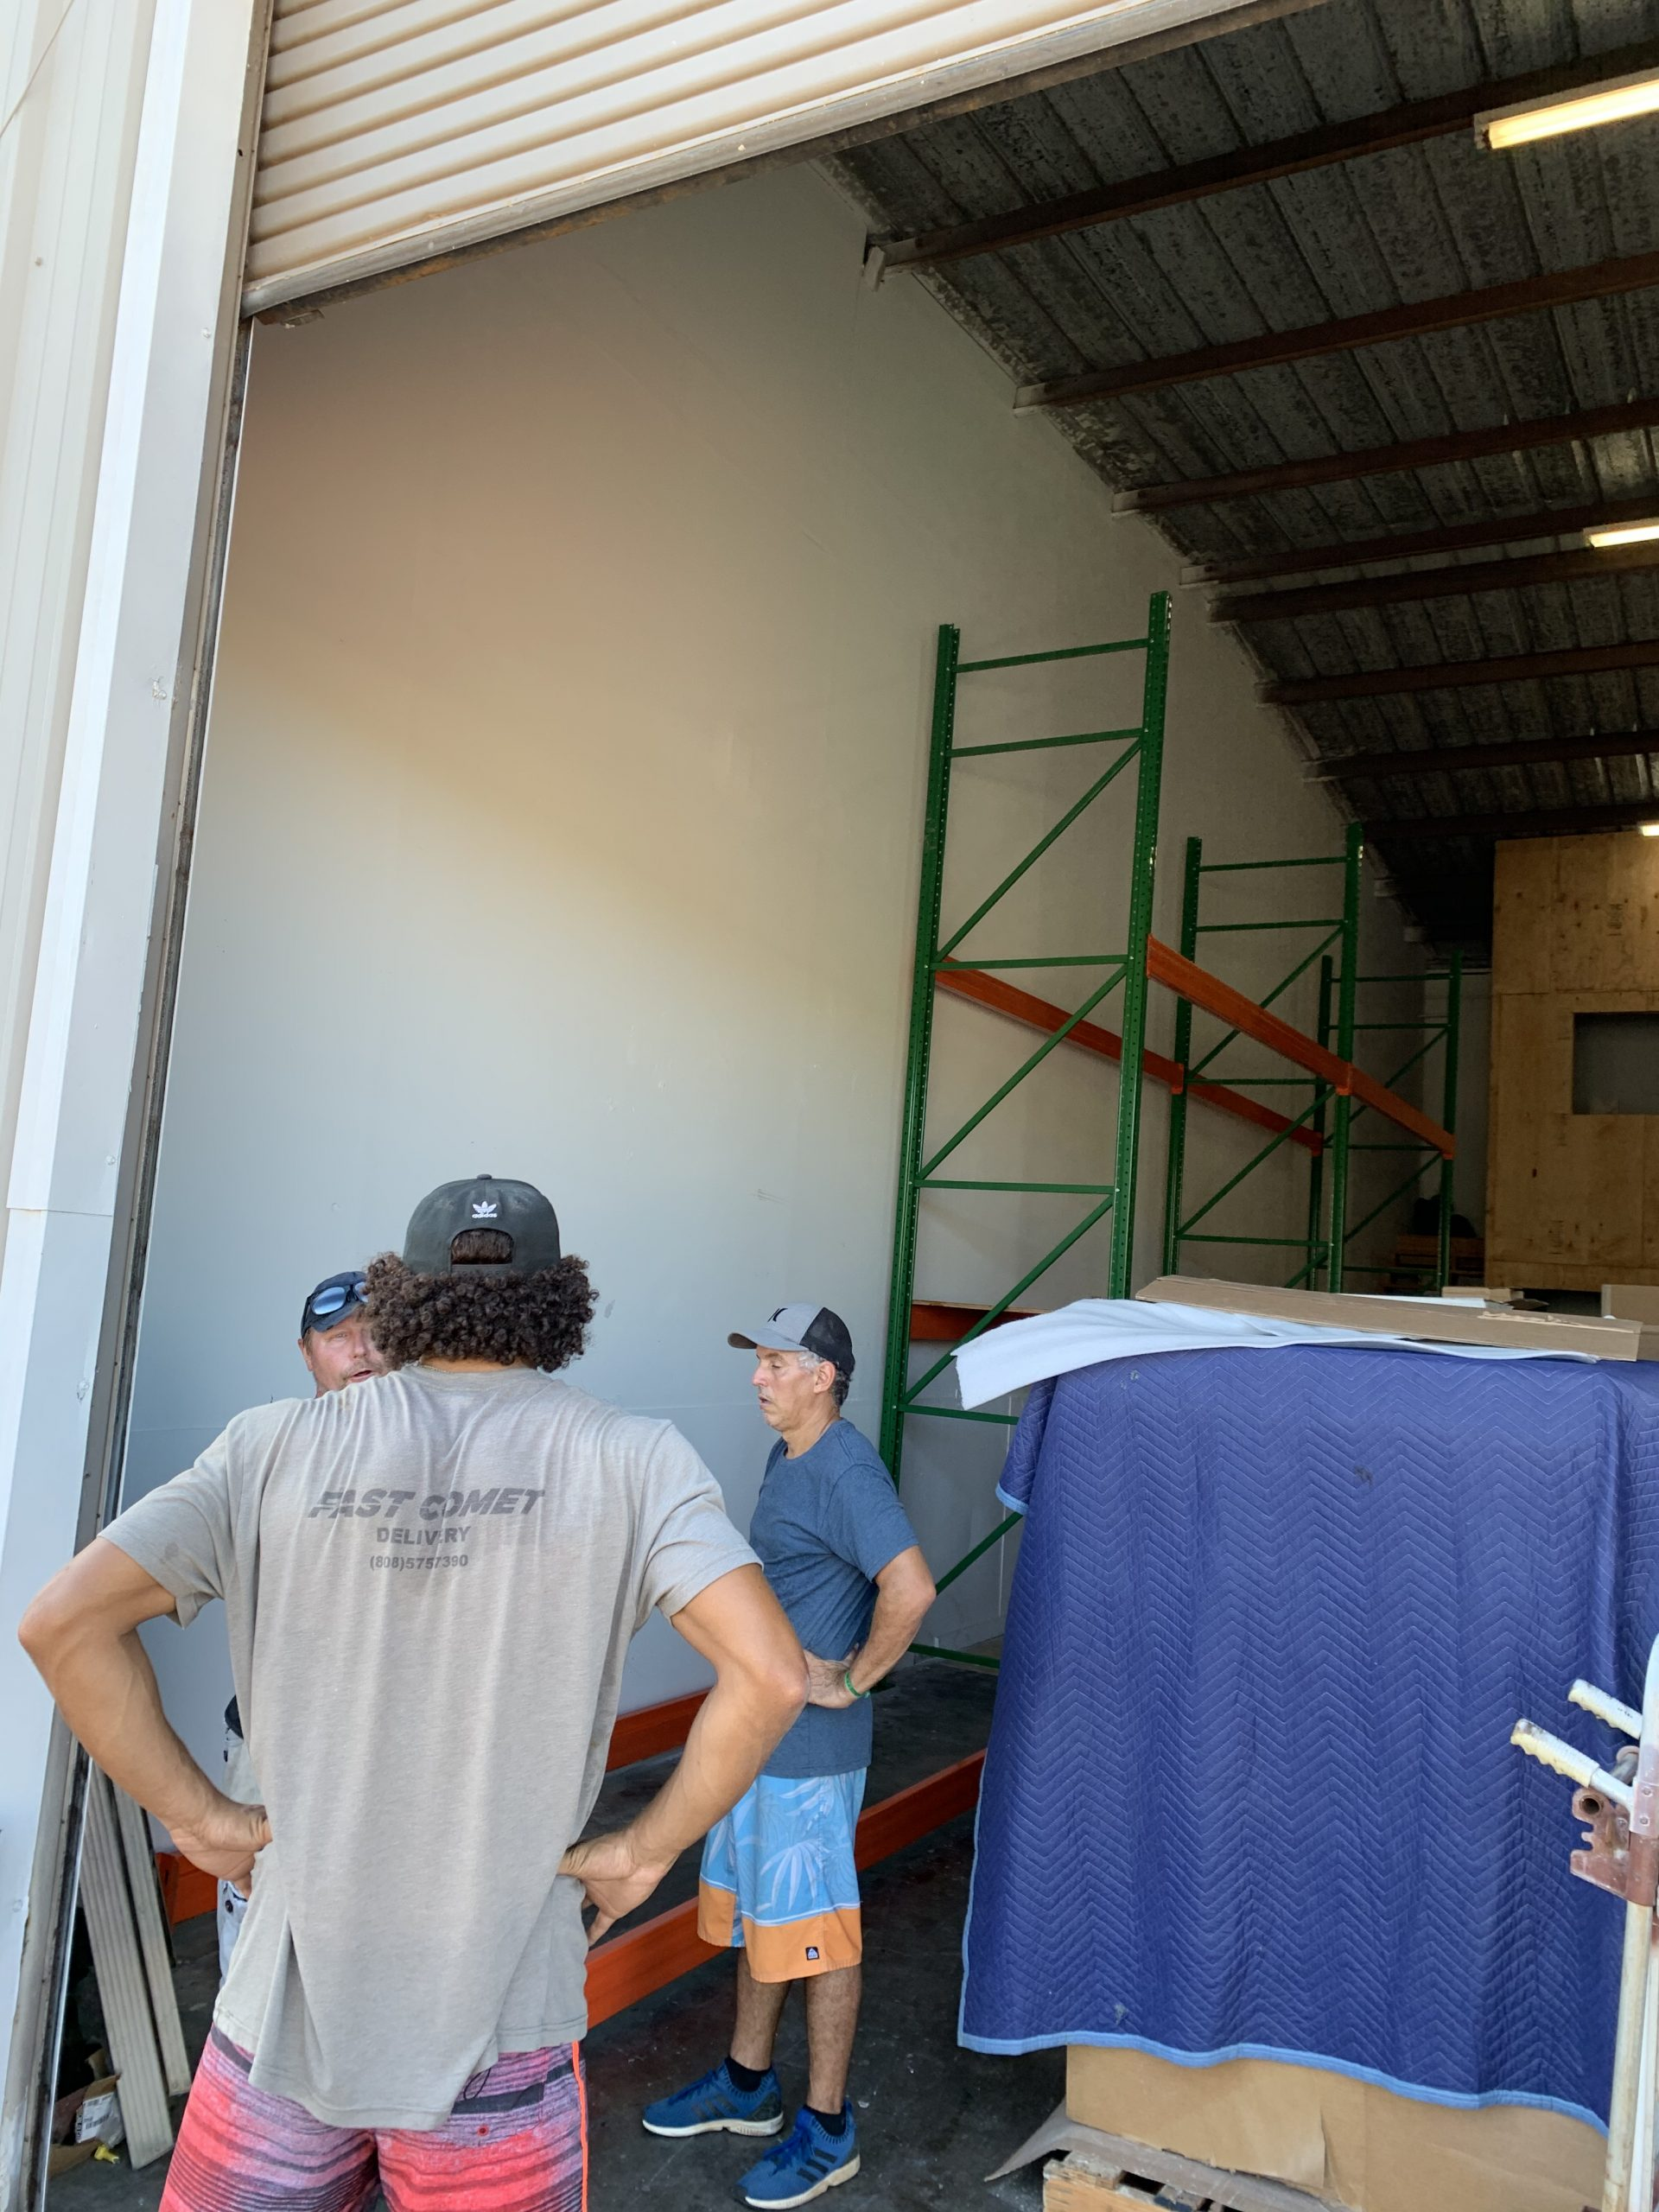 Fast Comet Warehouse 9 - Maui Hawaii - Movers